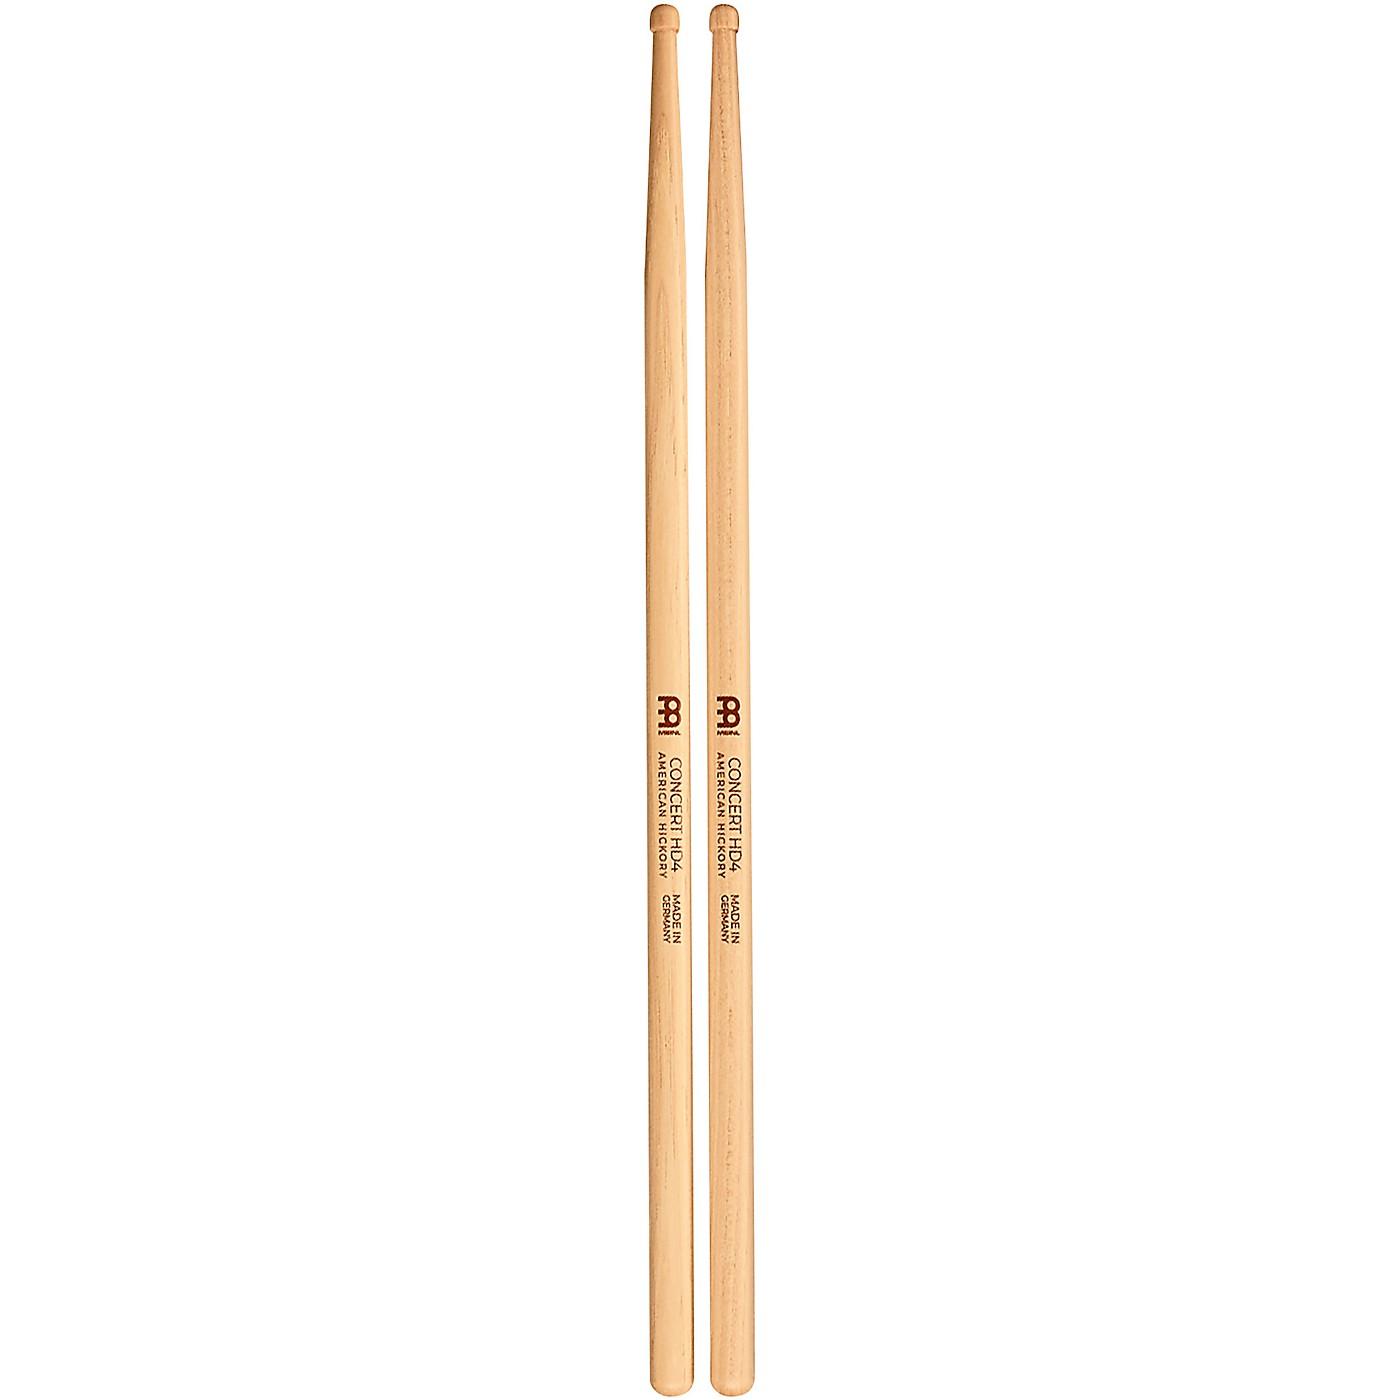 Meinl Stick & Brush HD4 Heavy Hickory Concert Drum Sticks thumbnail